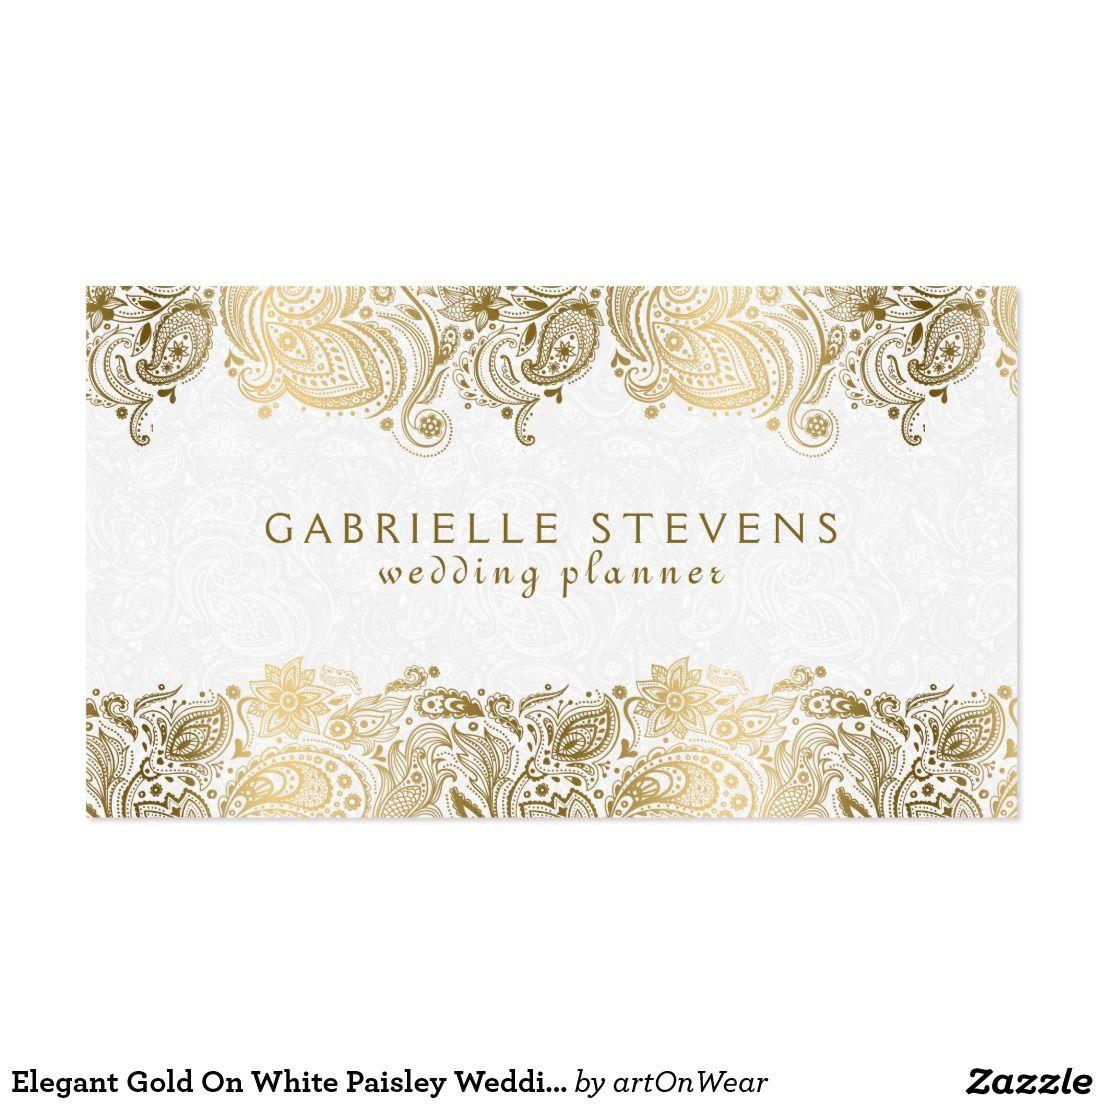 Elegant Gold On White Paisley Wedding Planner Business Card ...